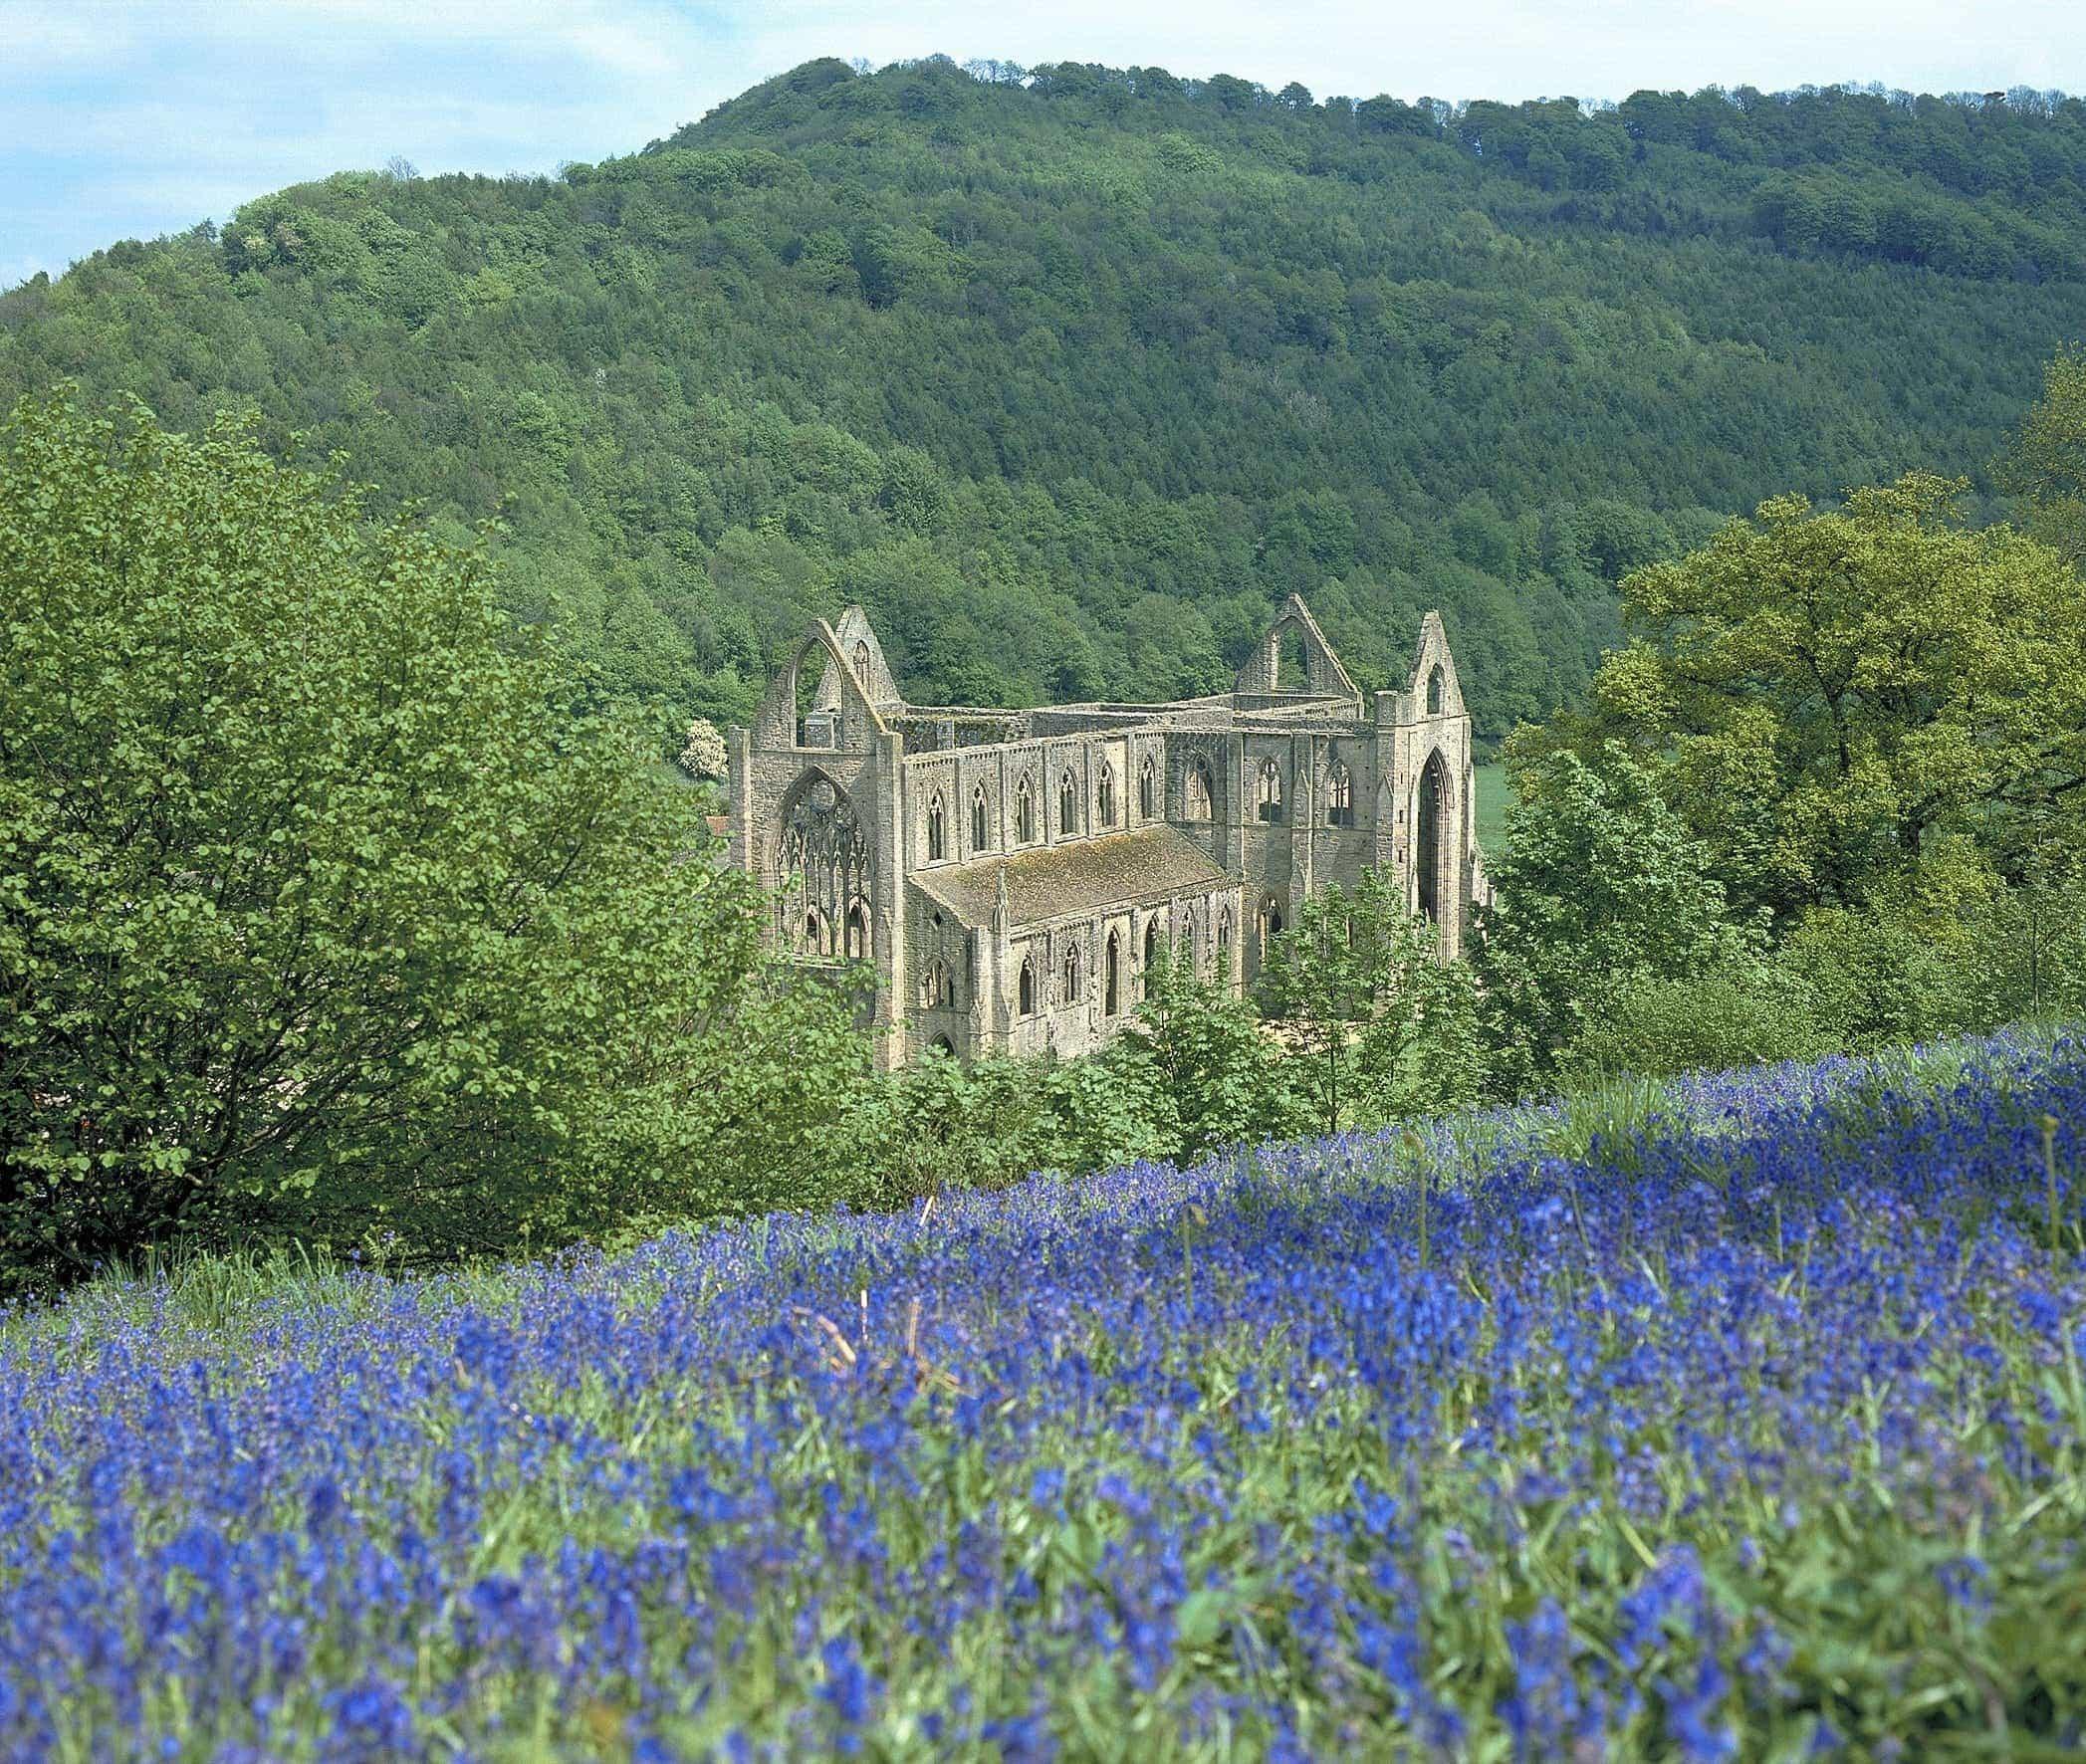 Bluebells at Tintern Abbey